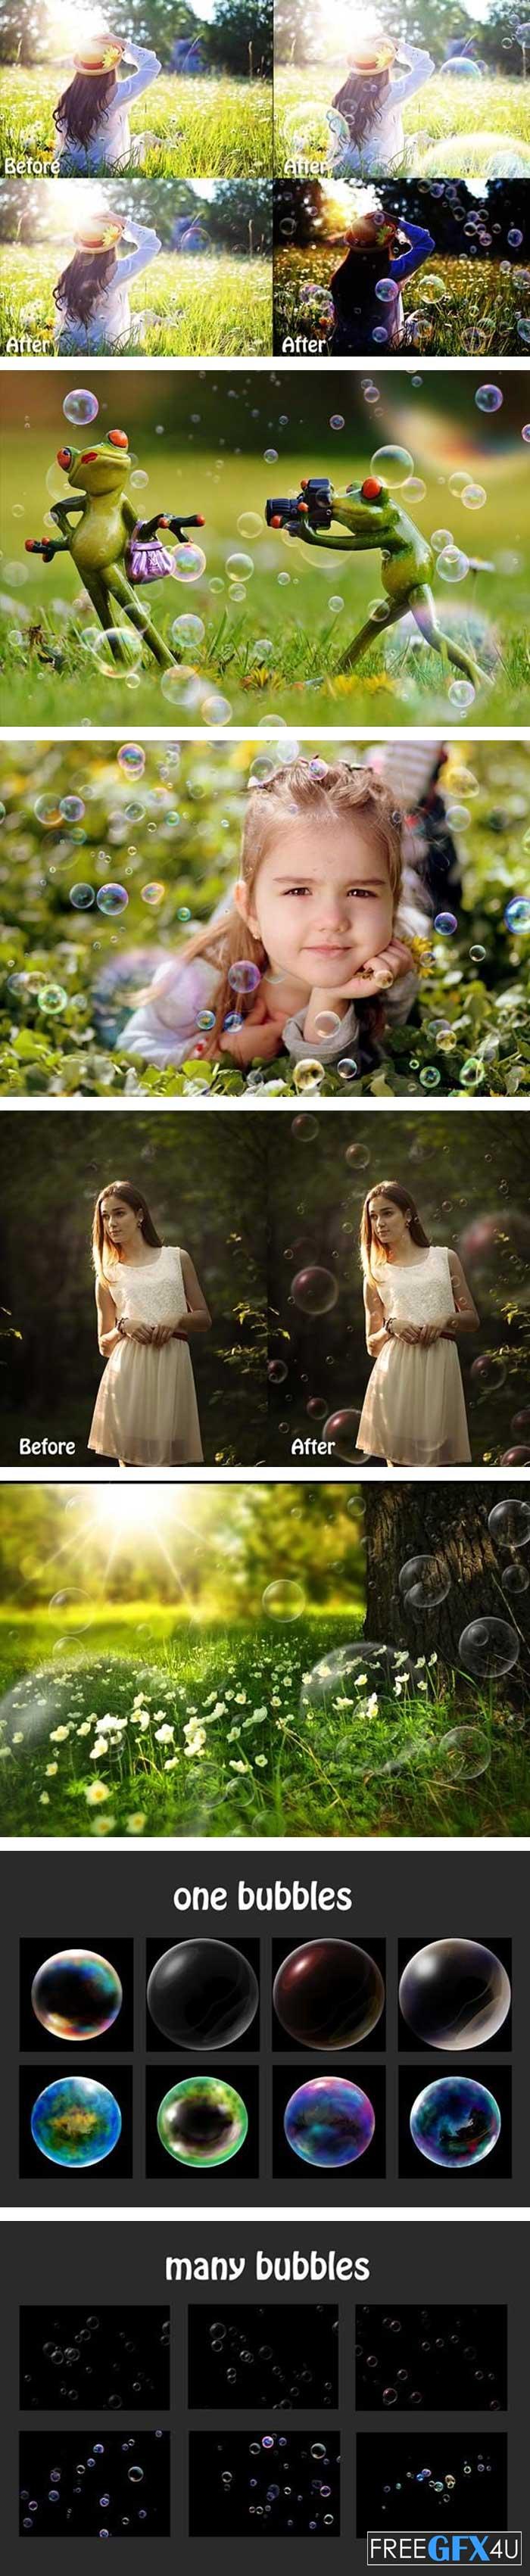 375 Bubbles Photo Overlays